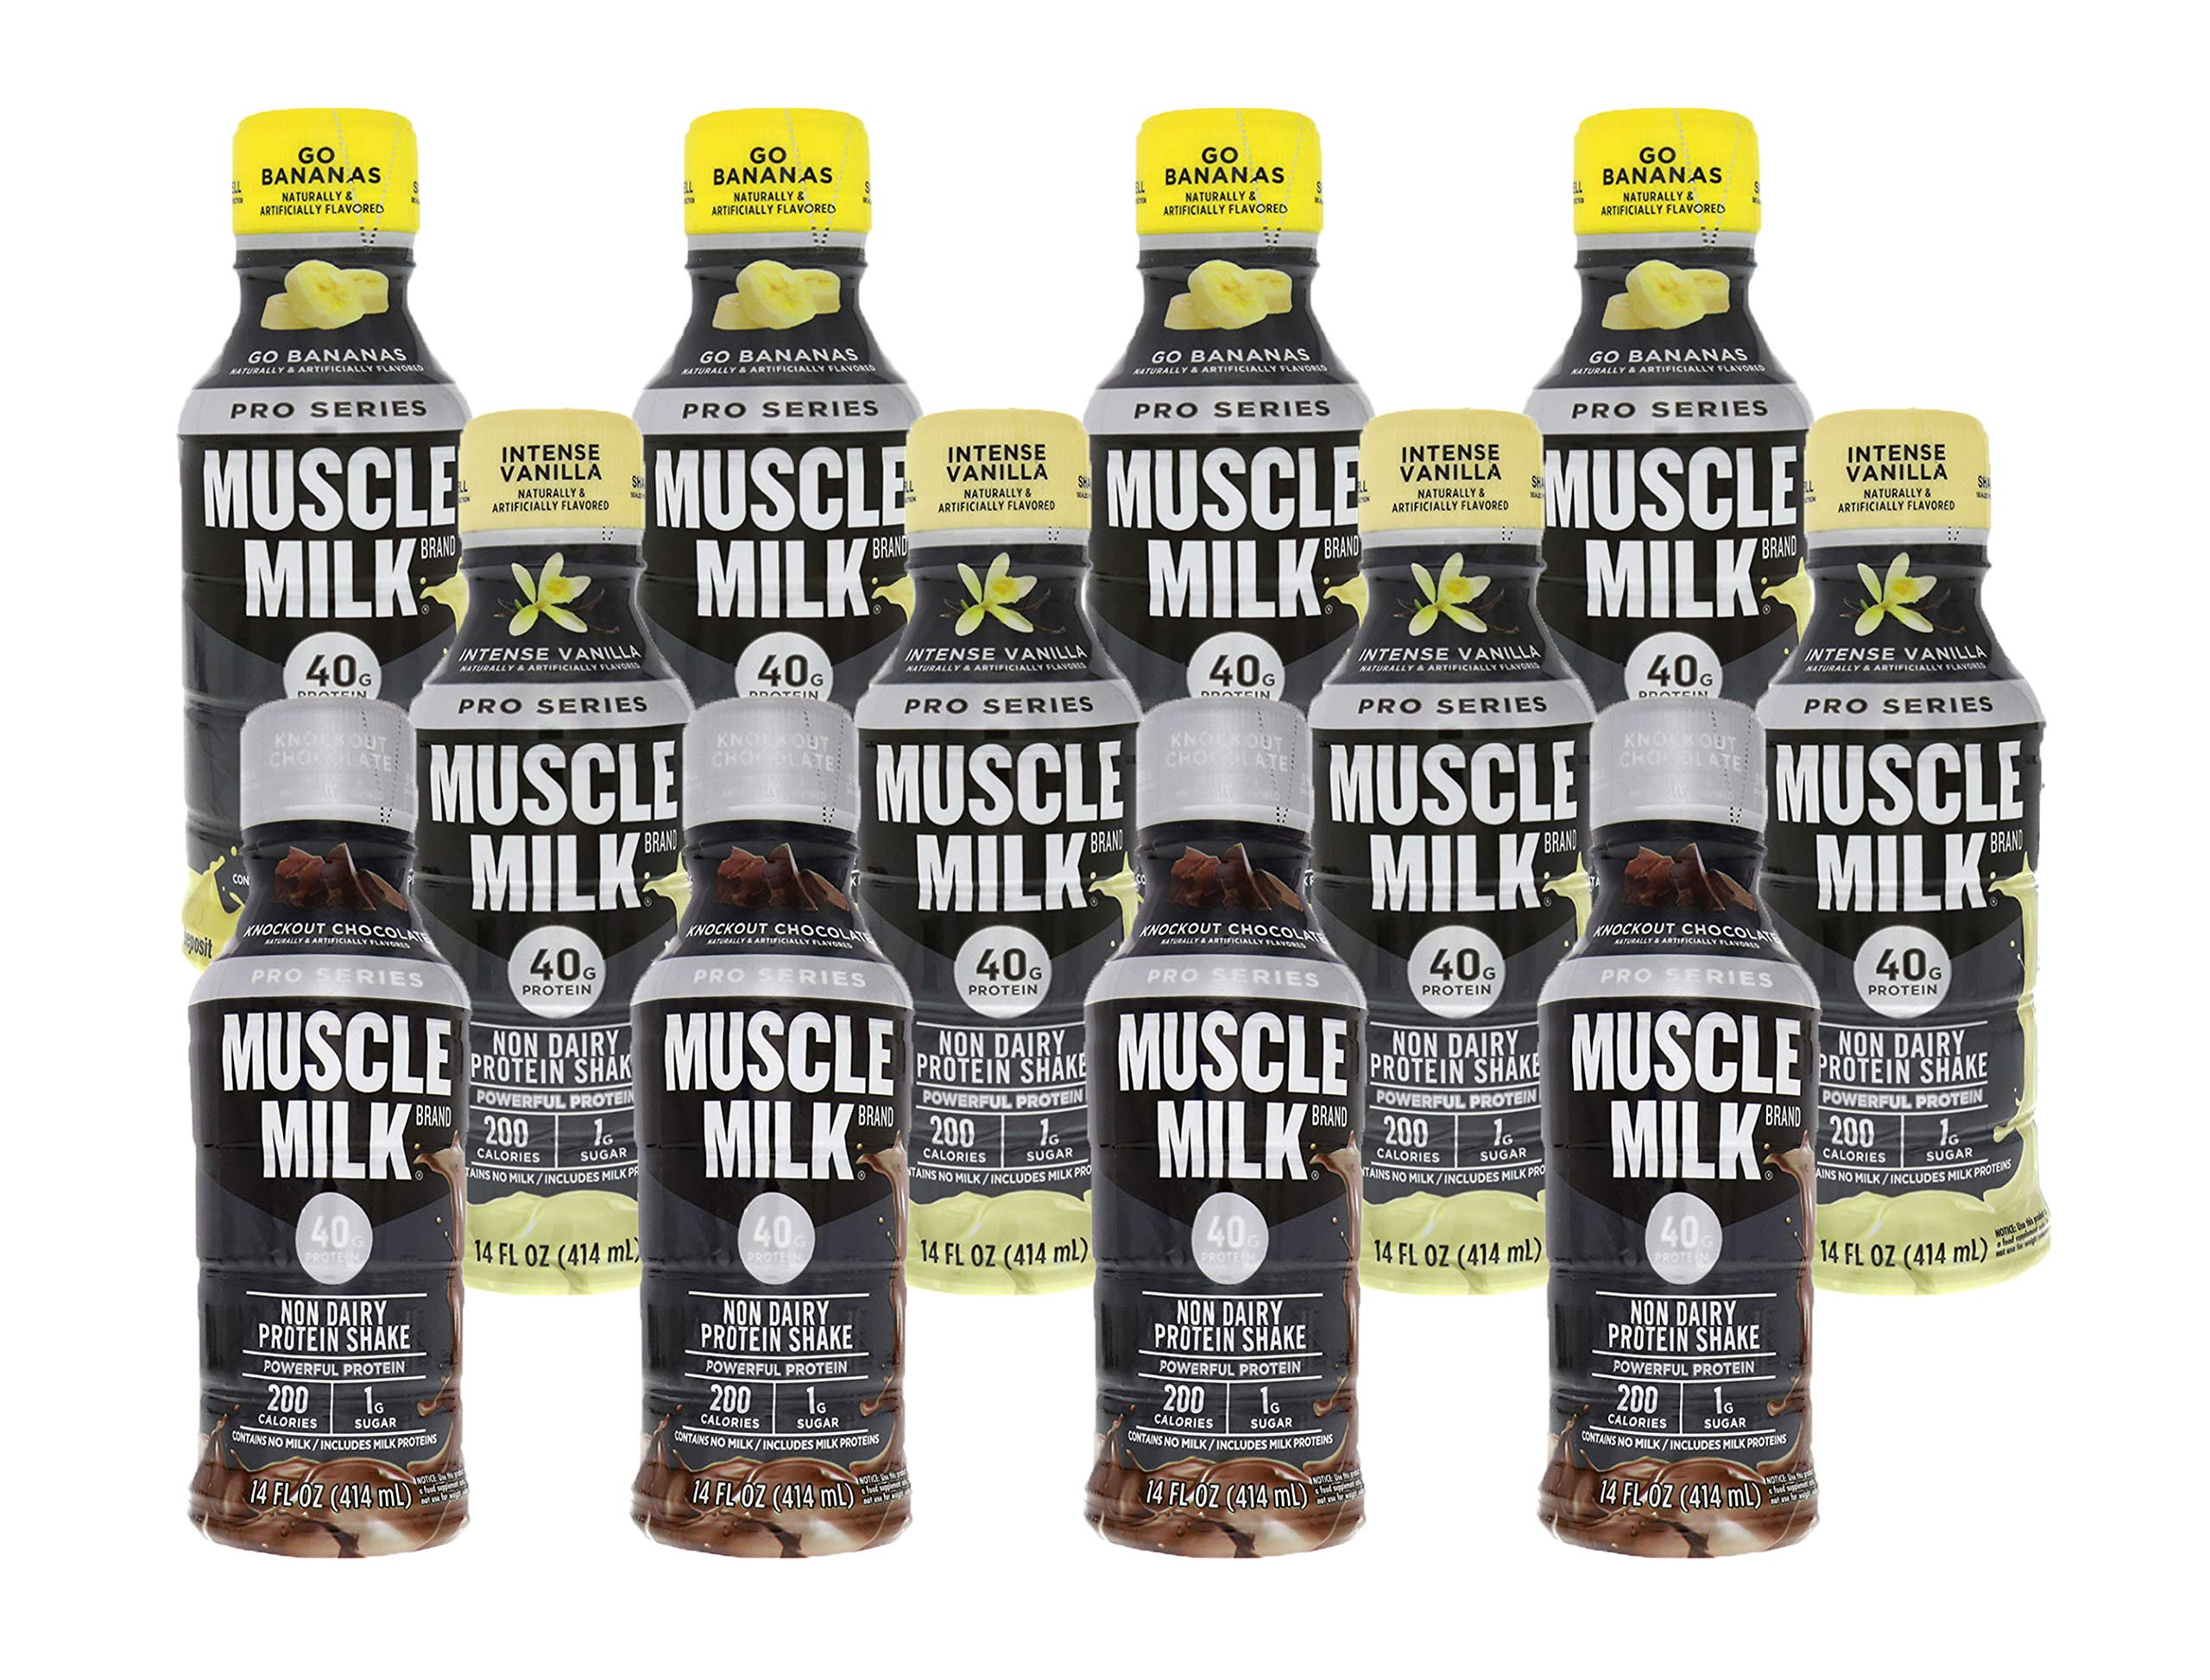 CytoSport Muscle Milk Pro Series 40 RTD Variety Pack 12-14 oz Bottles